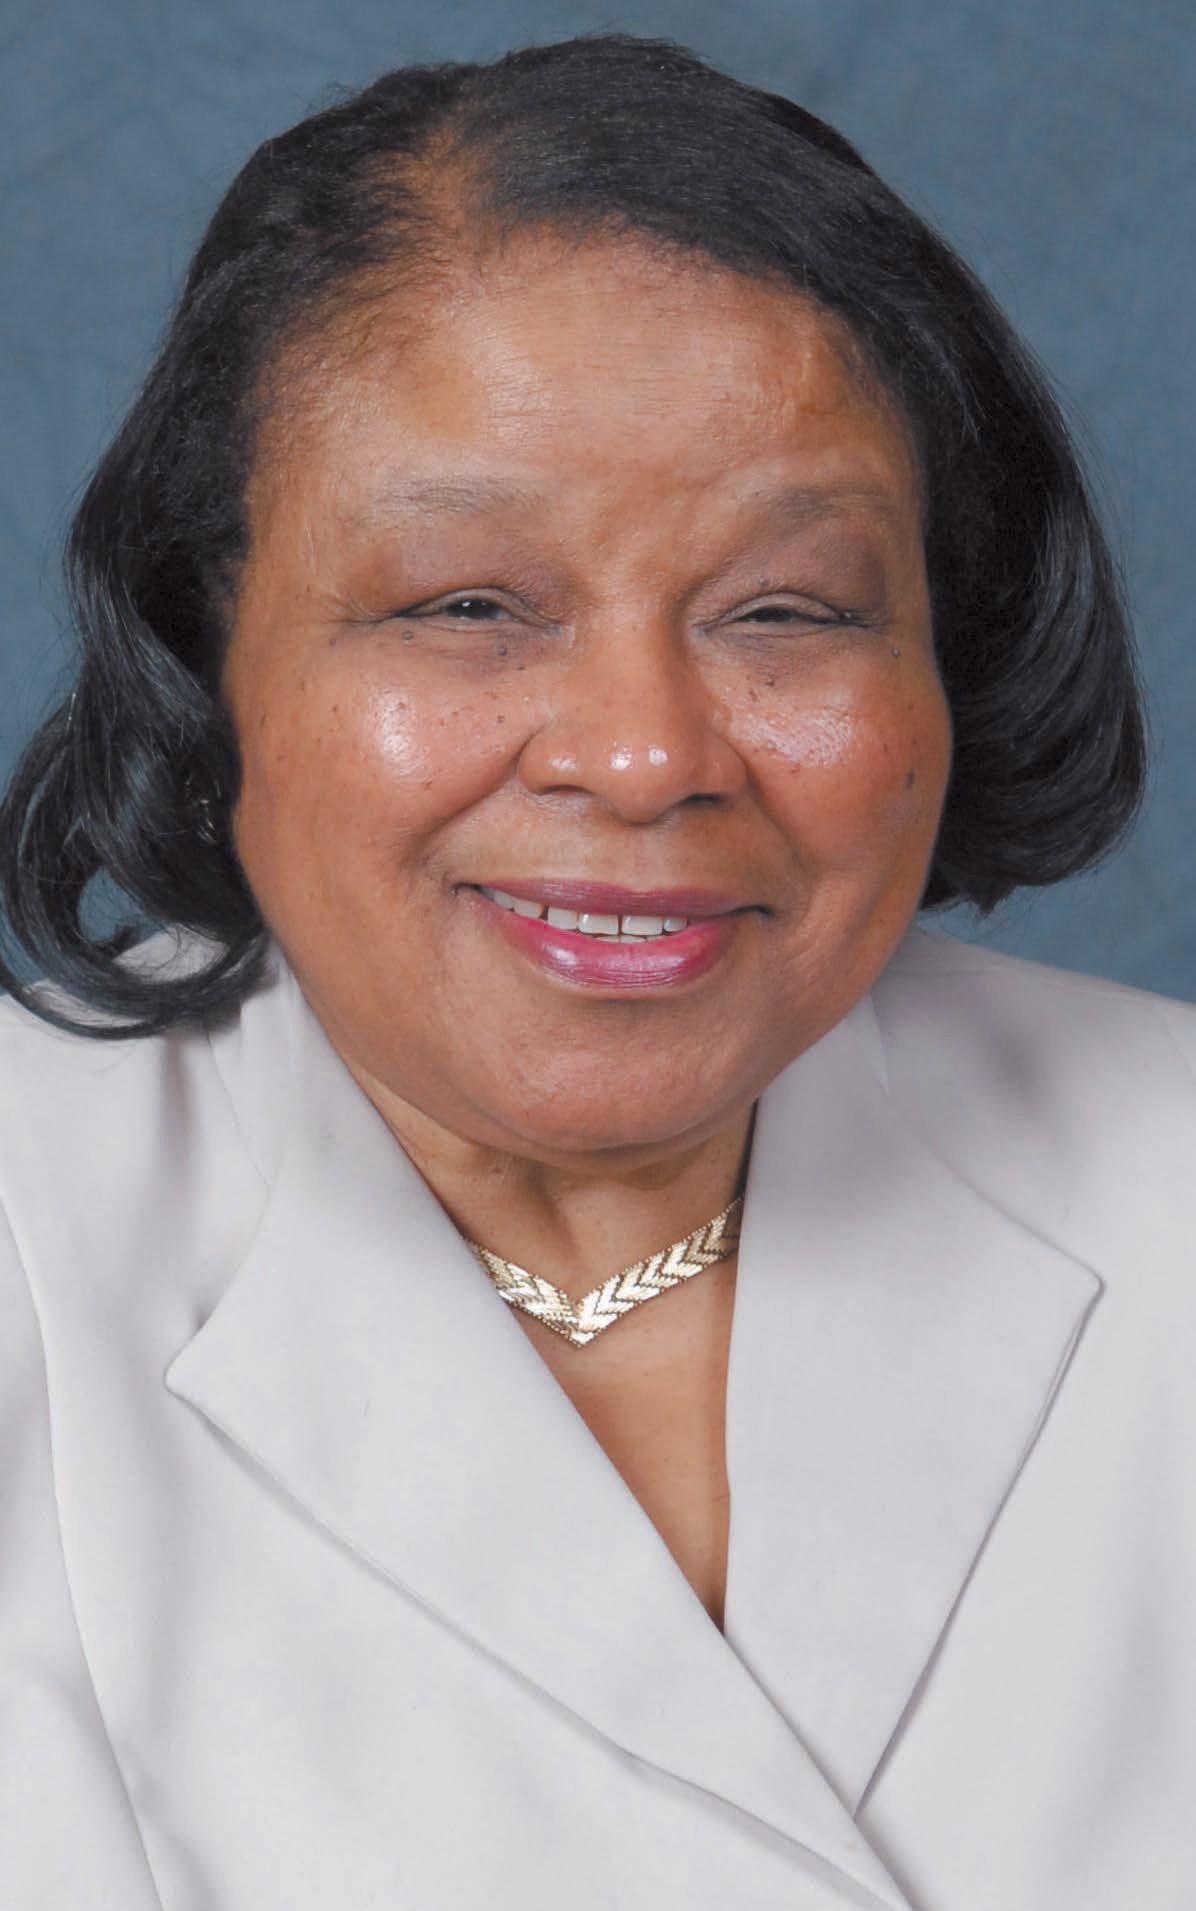 NAACP Secretary Carolyn Quilloin Coleman